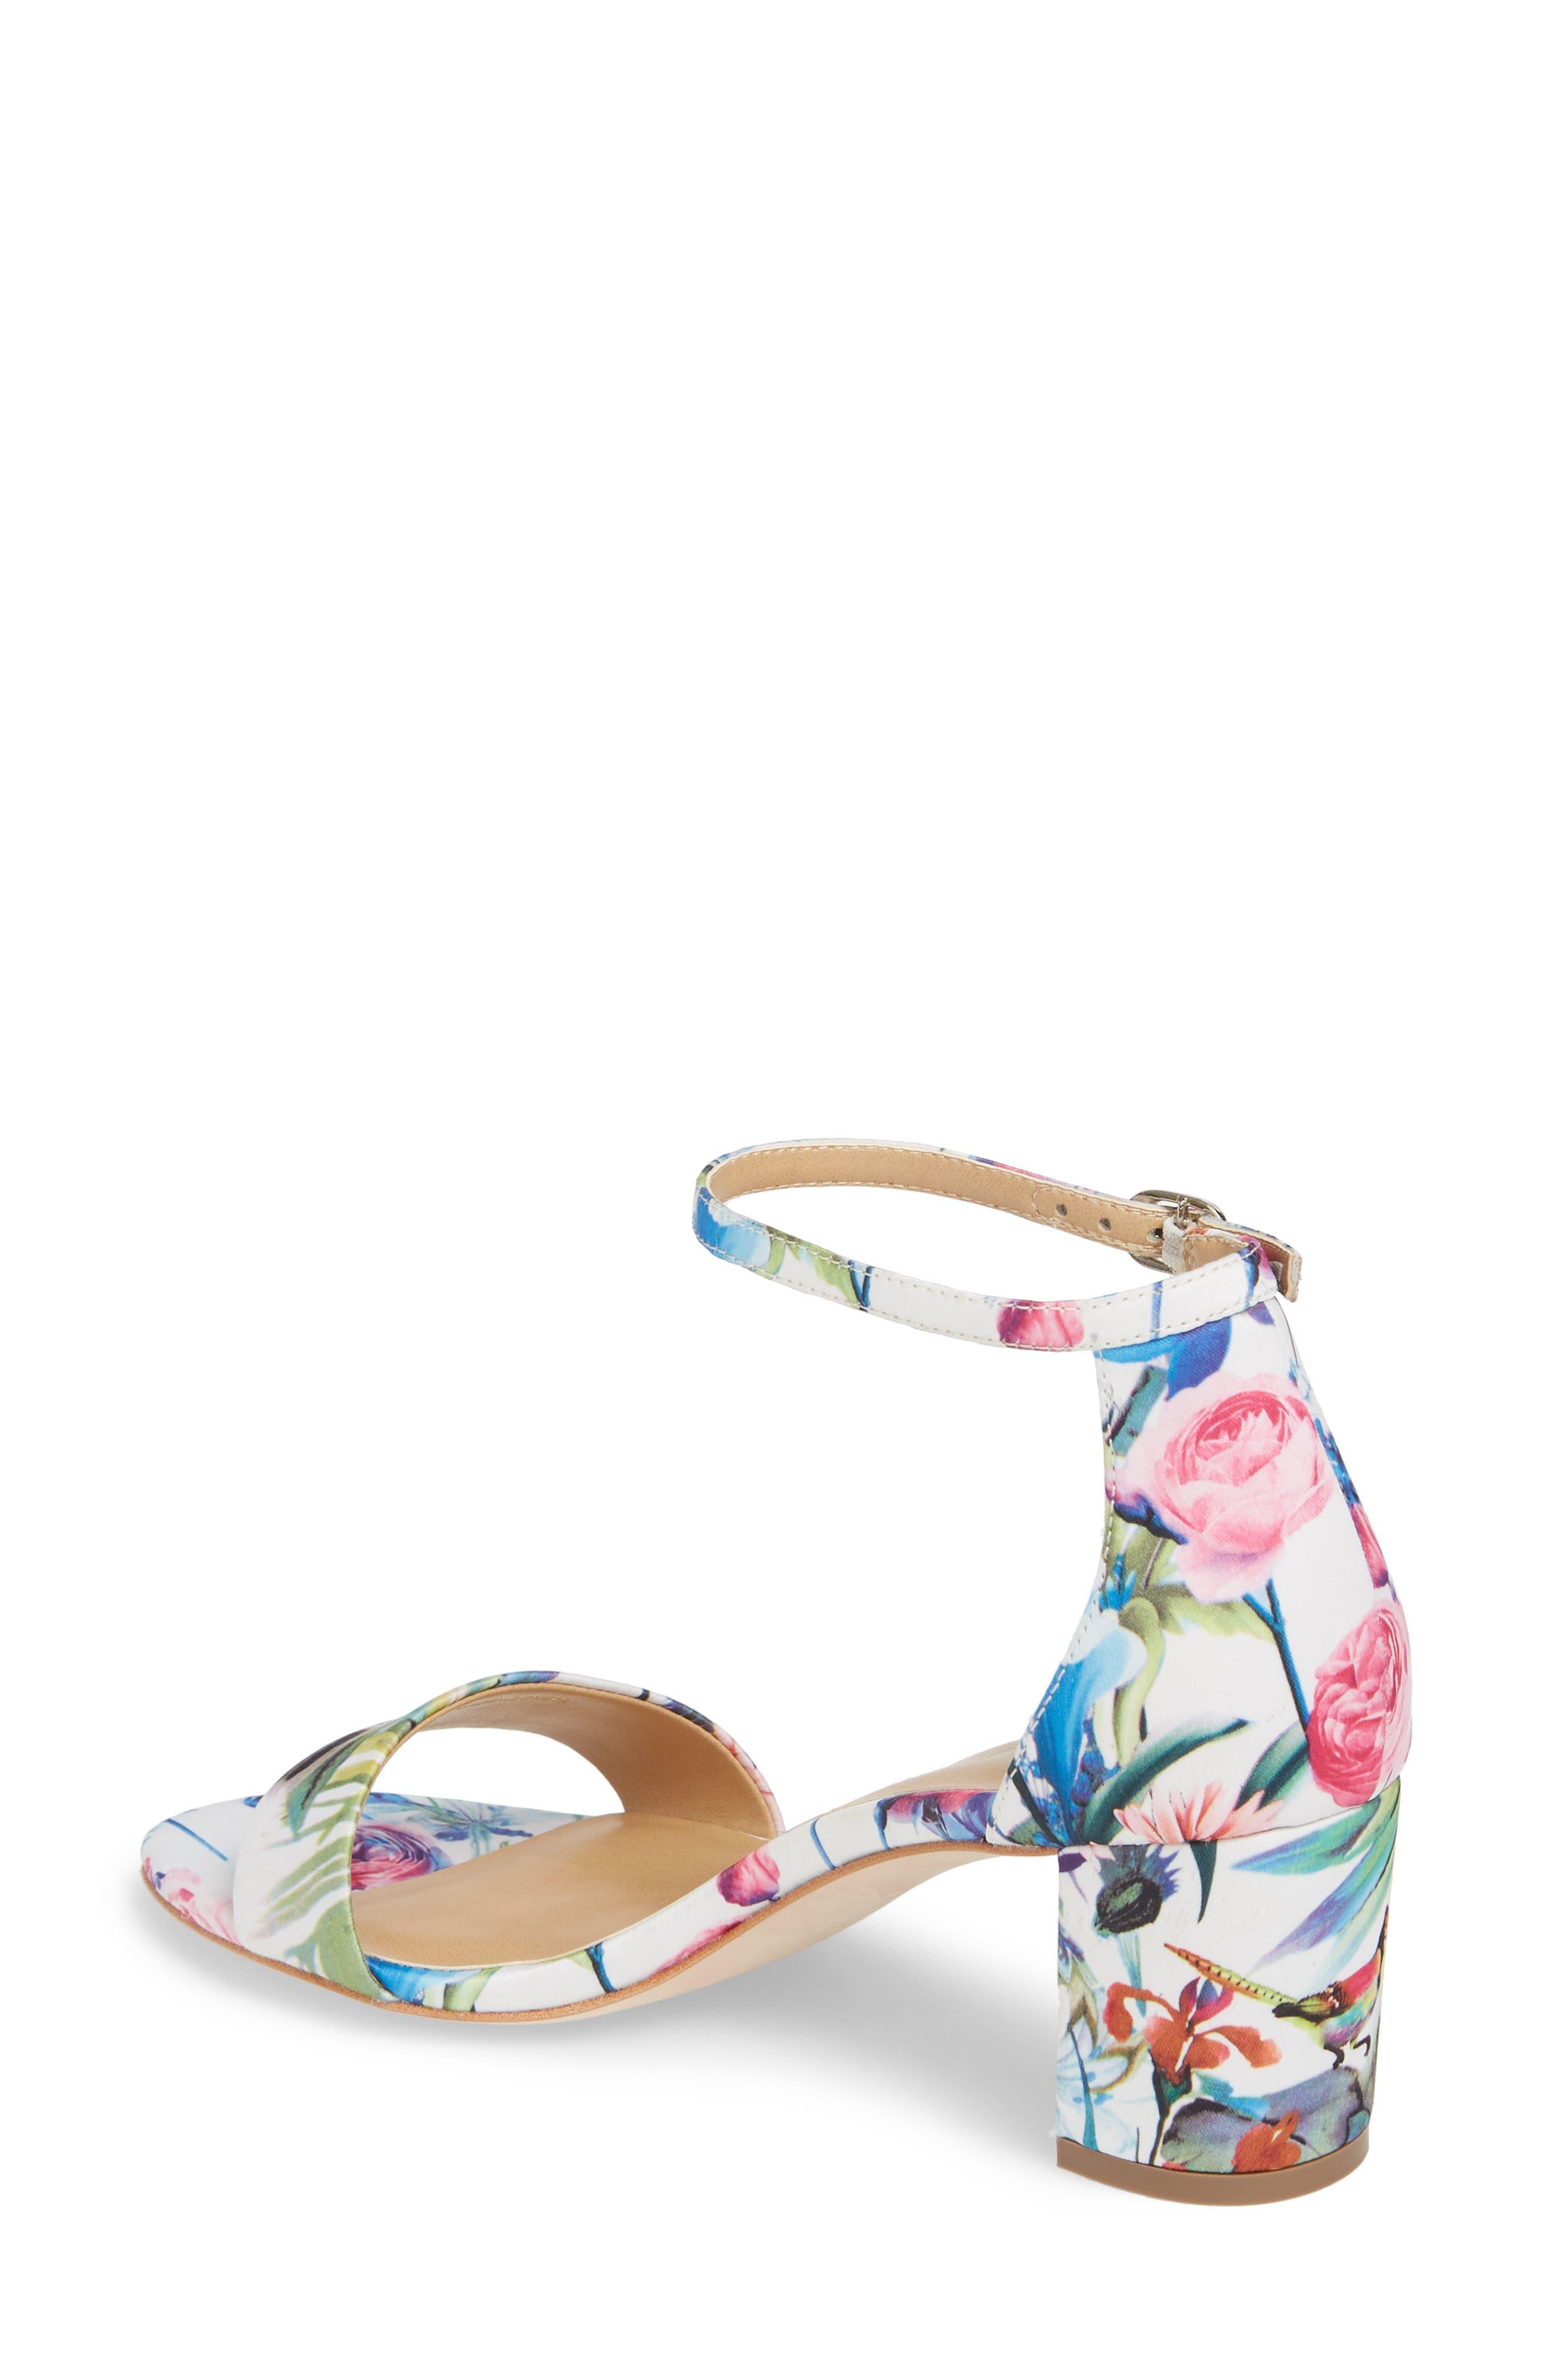 Meres Ankle Strap Sandal,                             Alternate thumbnail 2, color,                             400